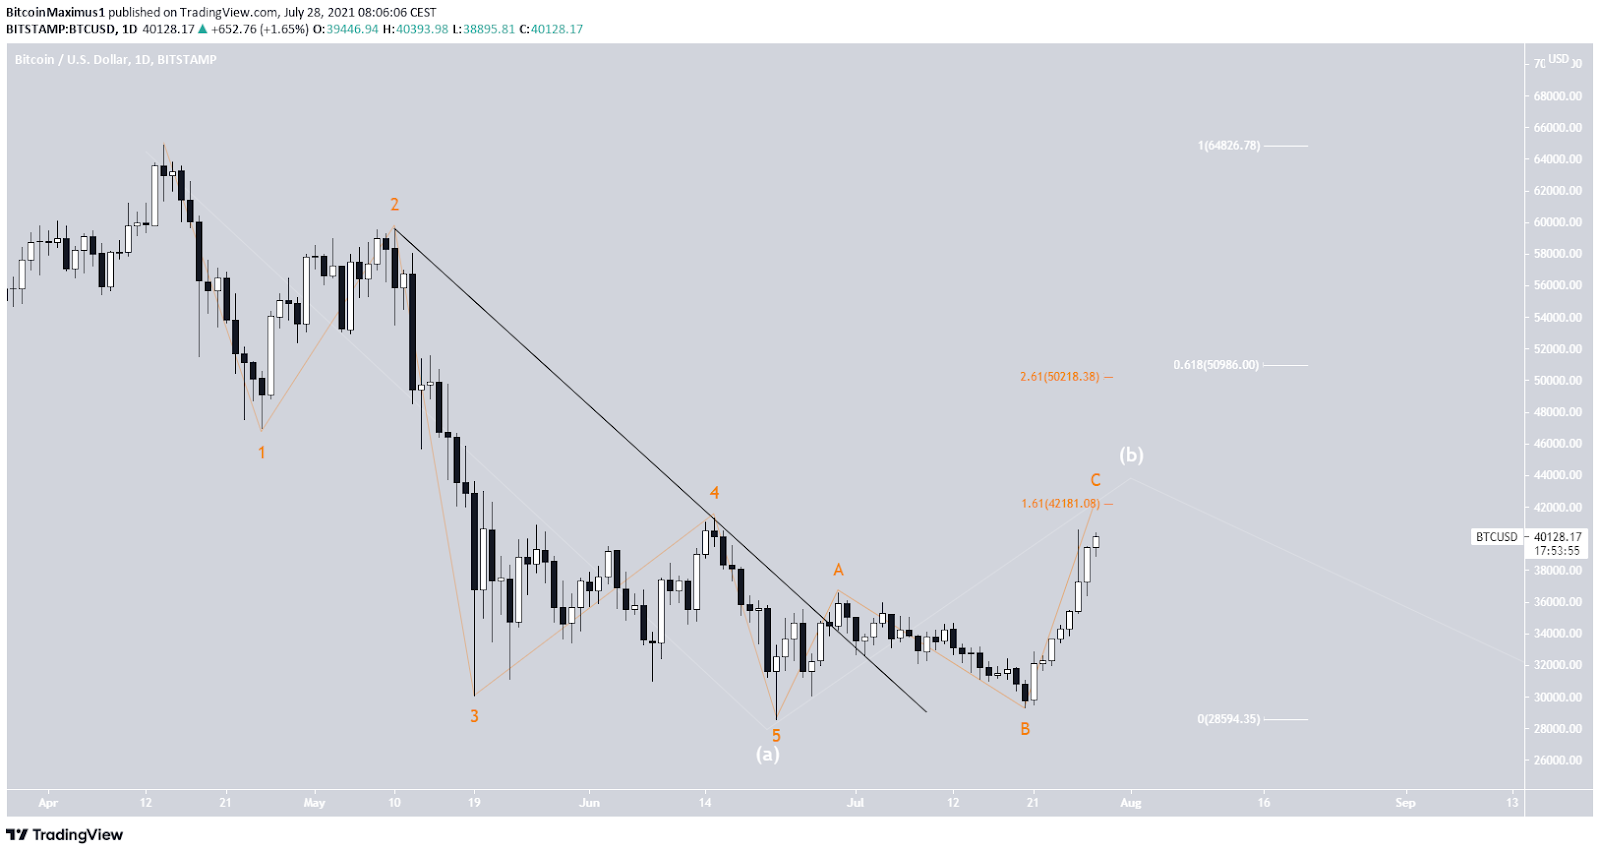 Bitcoin Preis Wellenanalyse 2 BTC Kurs 28.07.2021